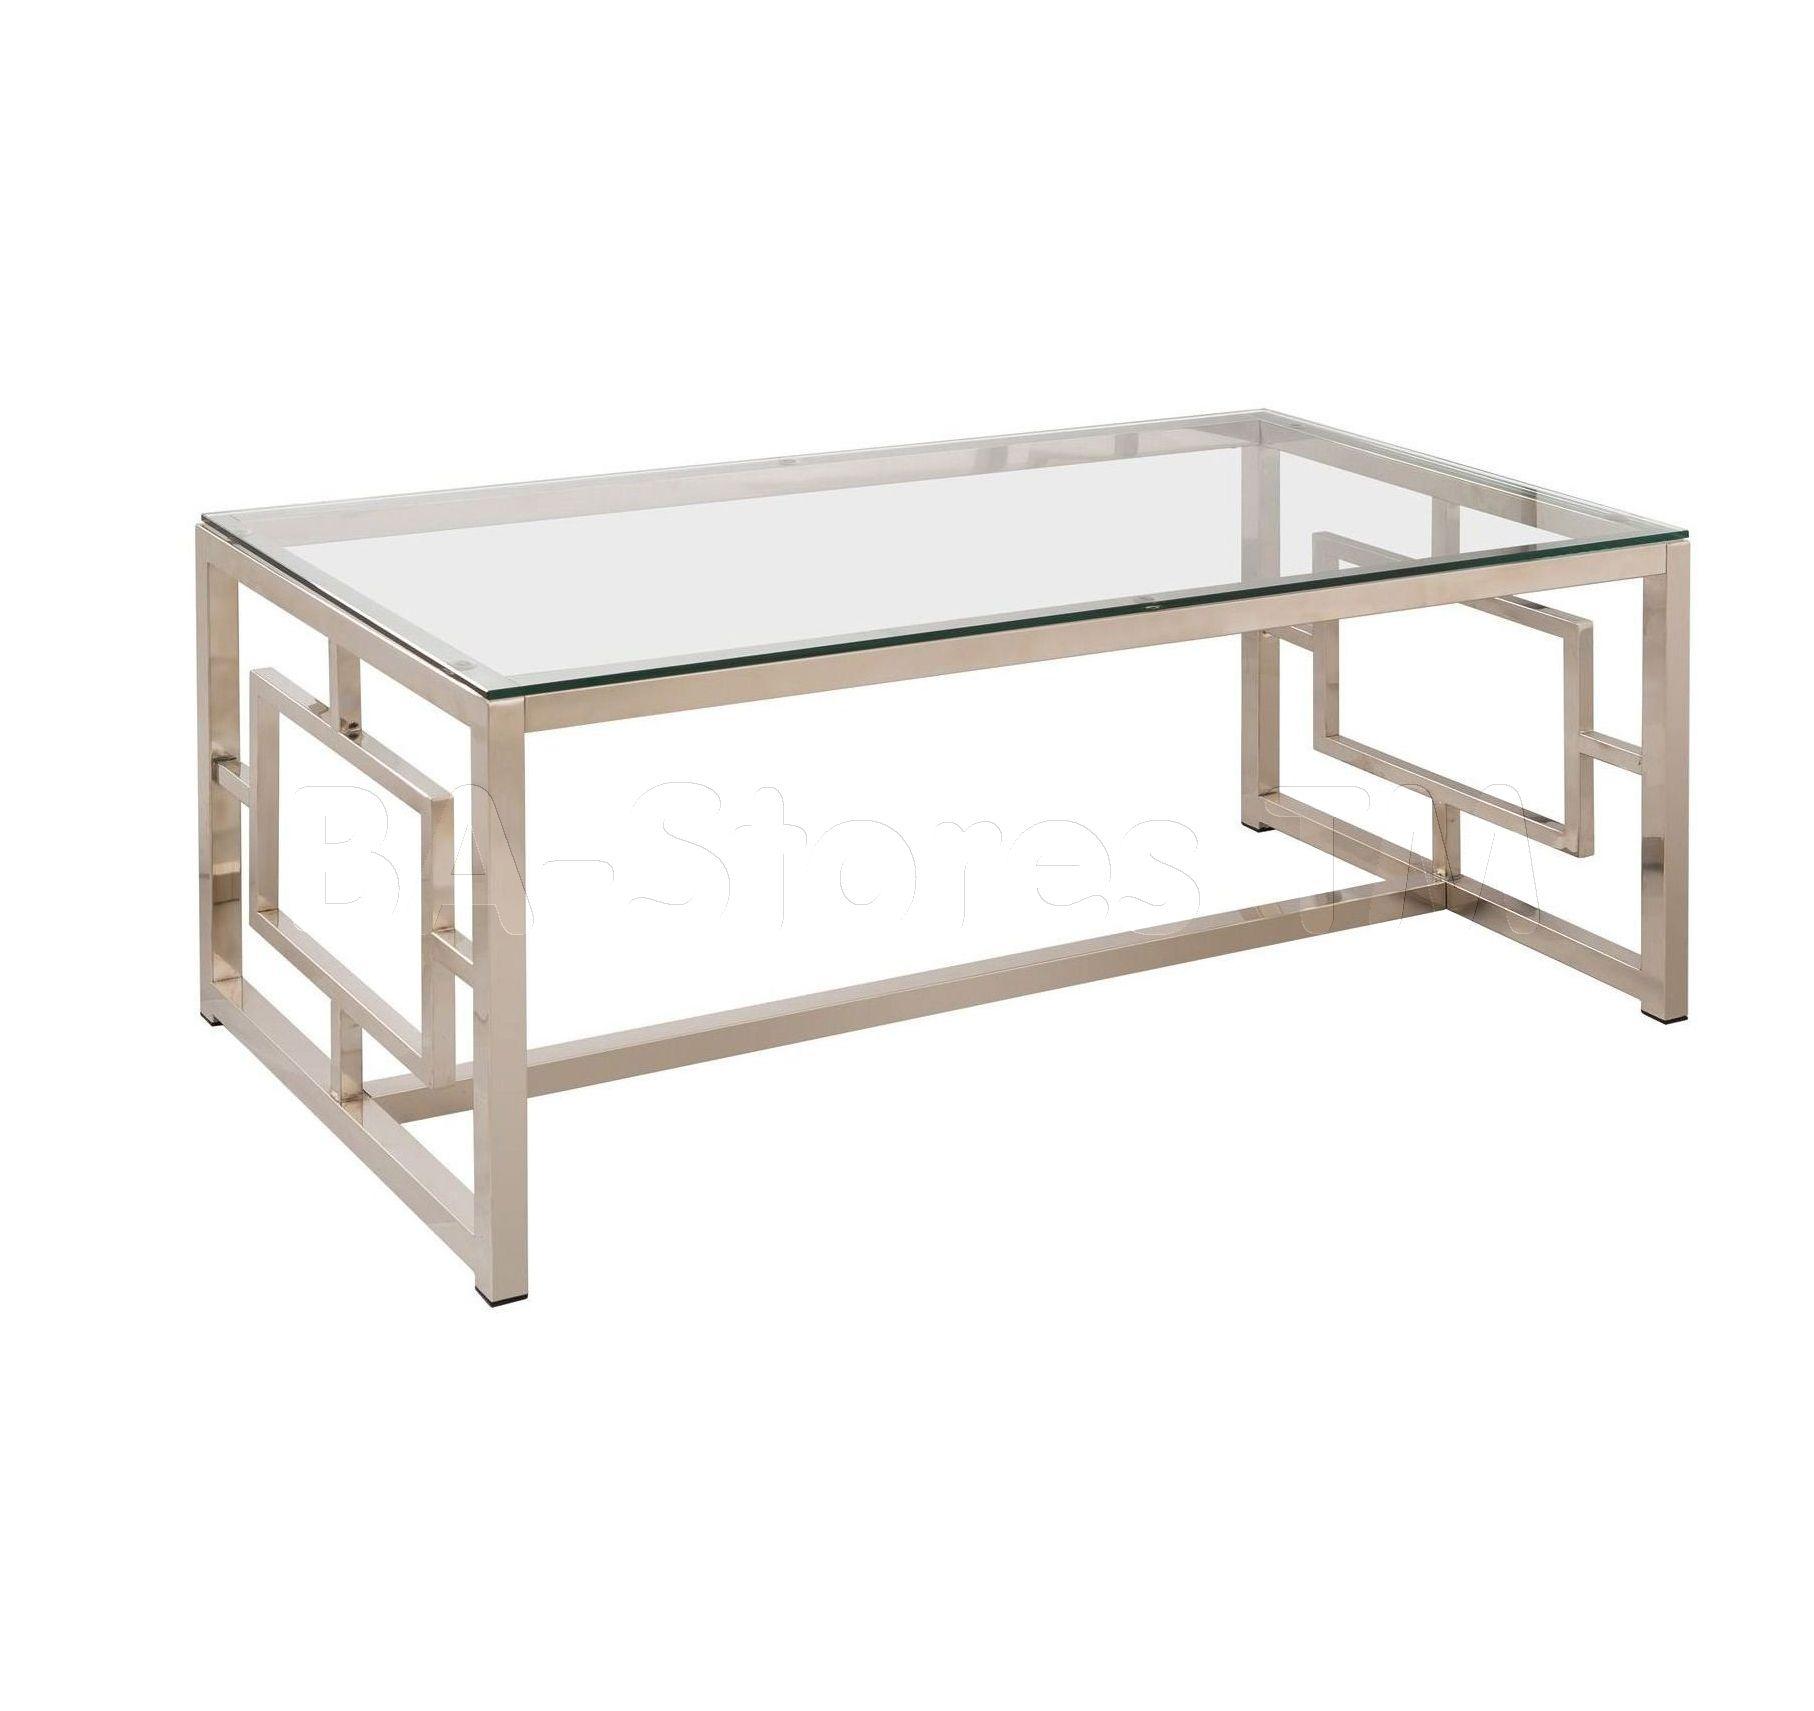 Satin Nickel Glass Top Coffee Table